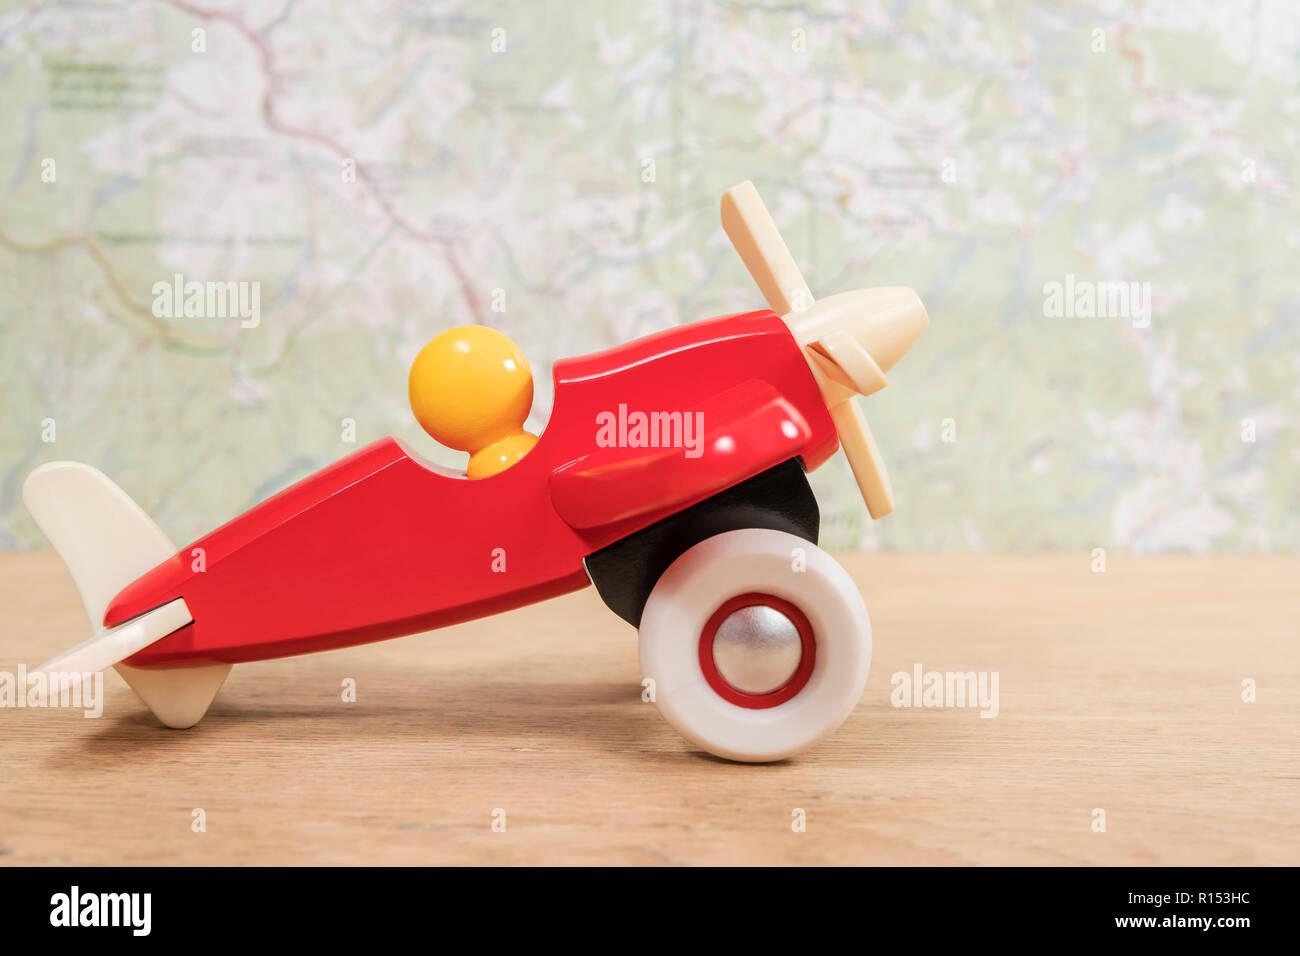 Stockamp; De Imágenes Old Wooden On Toy Plane HID29E